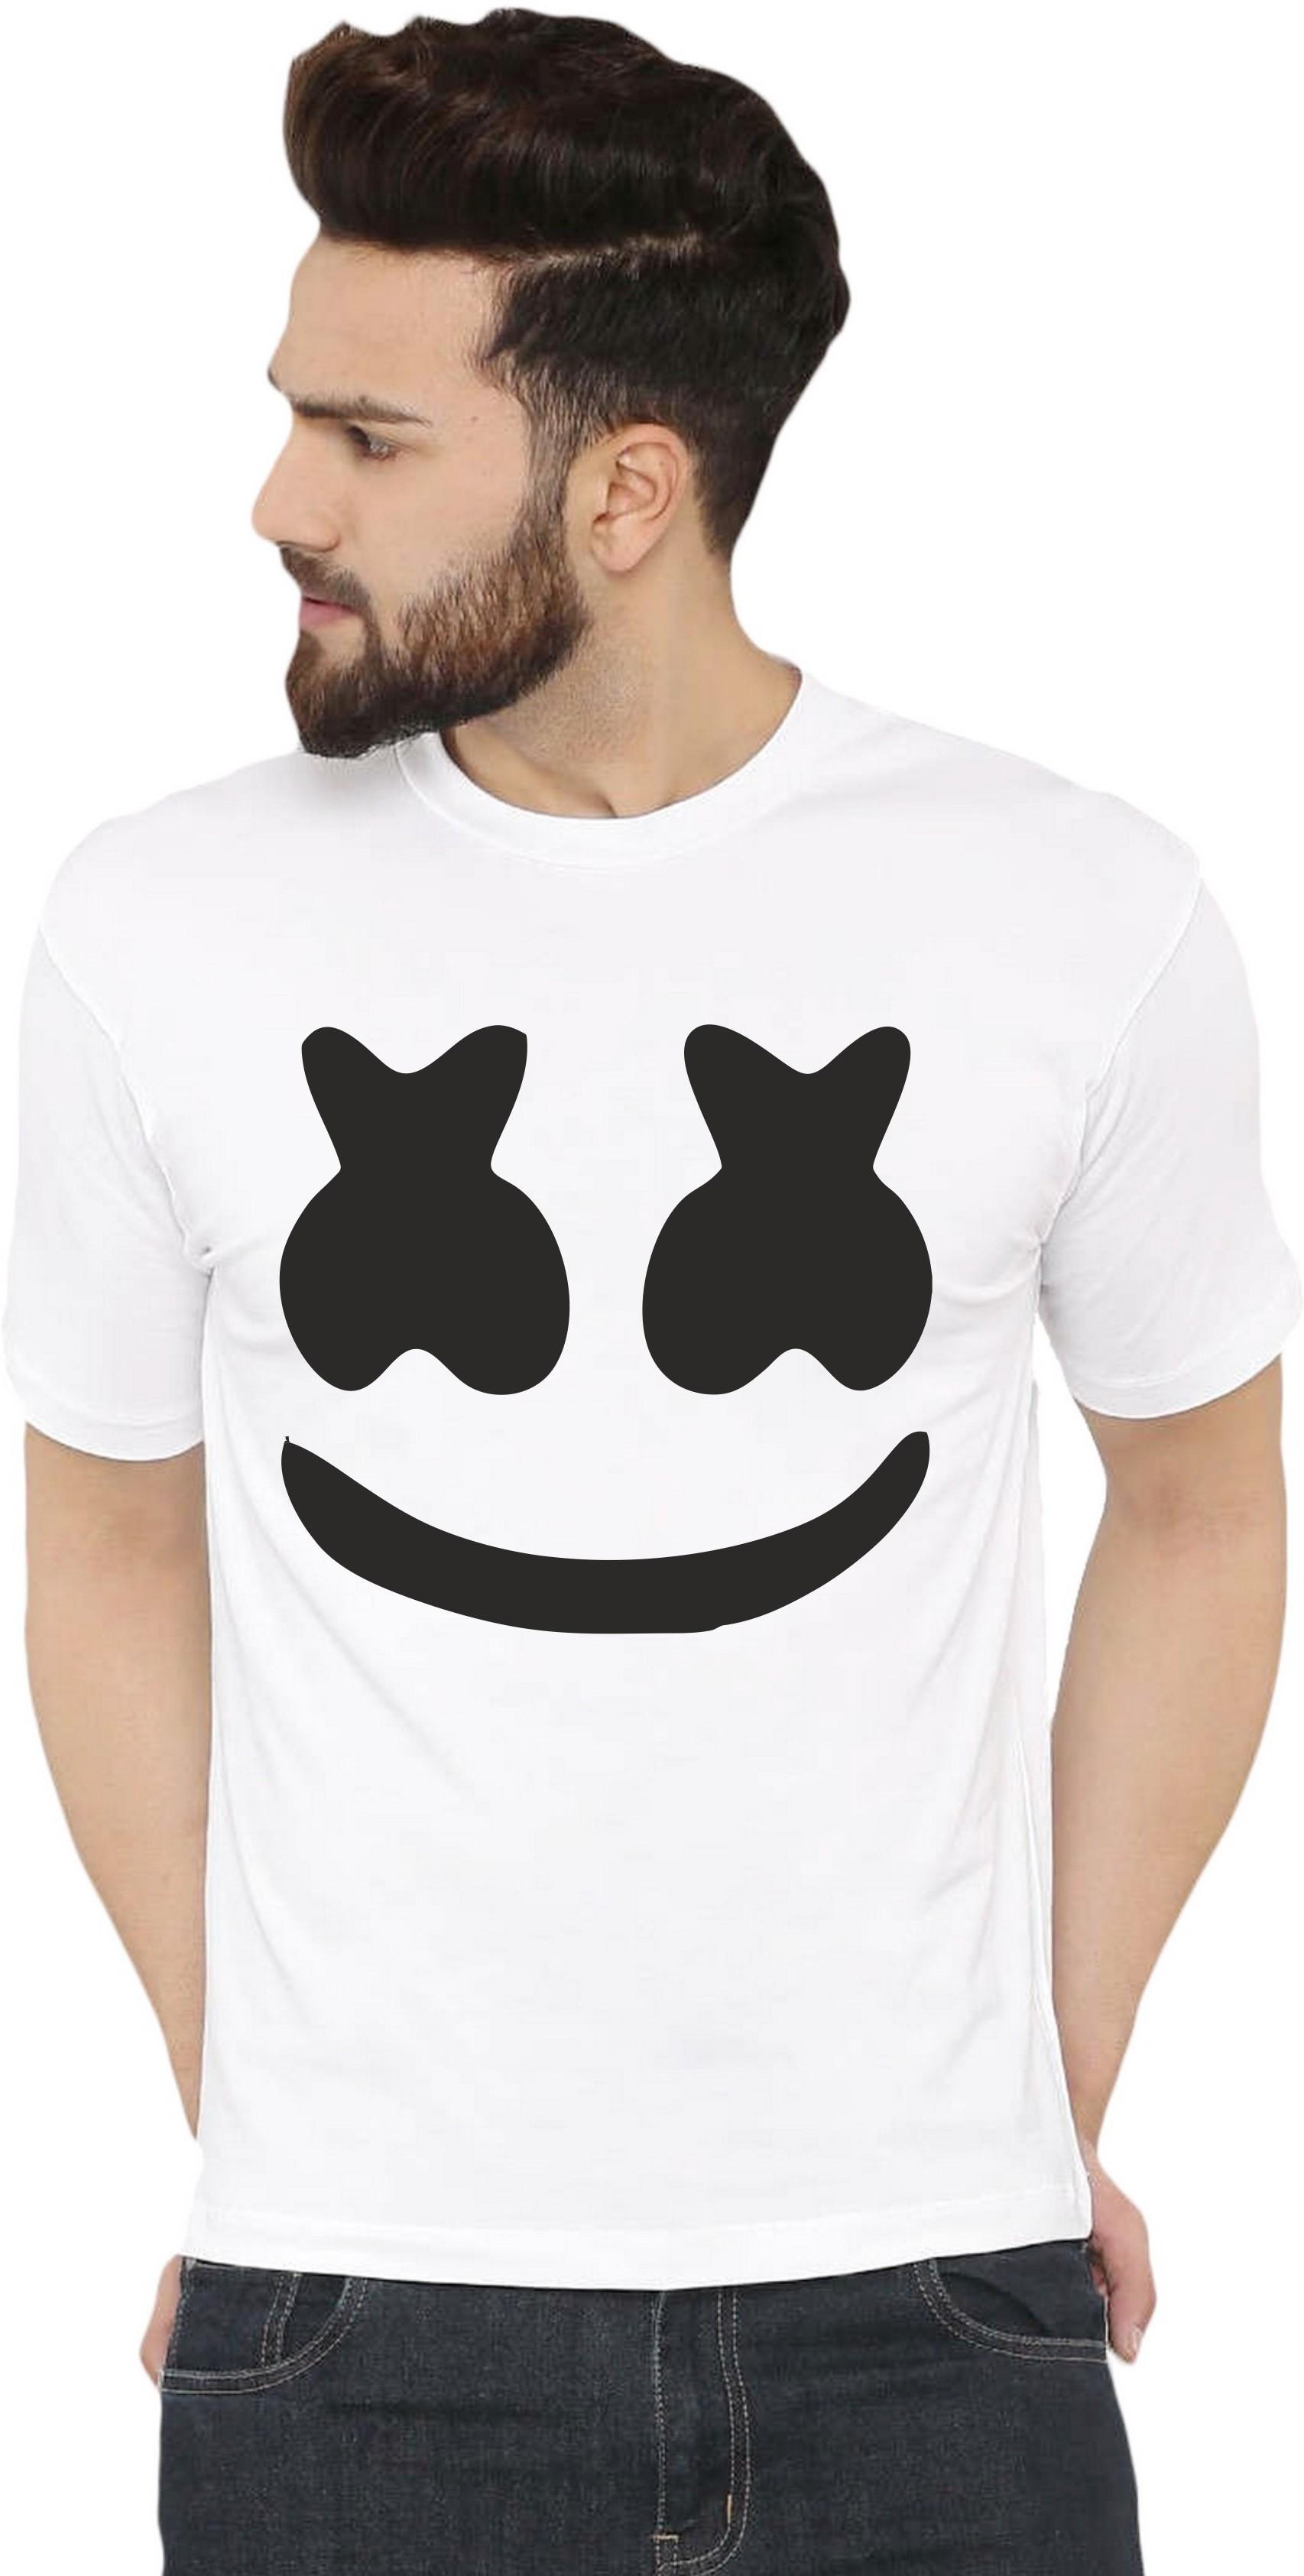 Graphic Print Men Round Neck White, Black T-Shirt